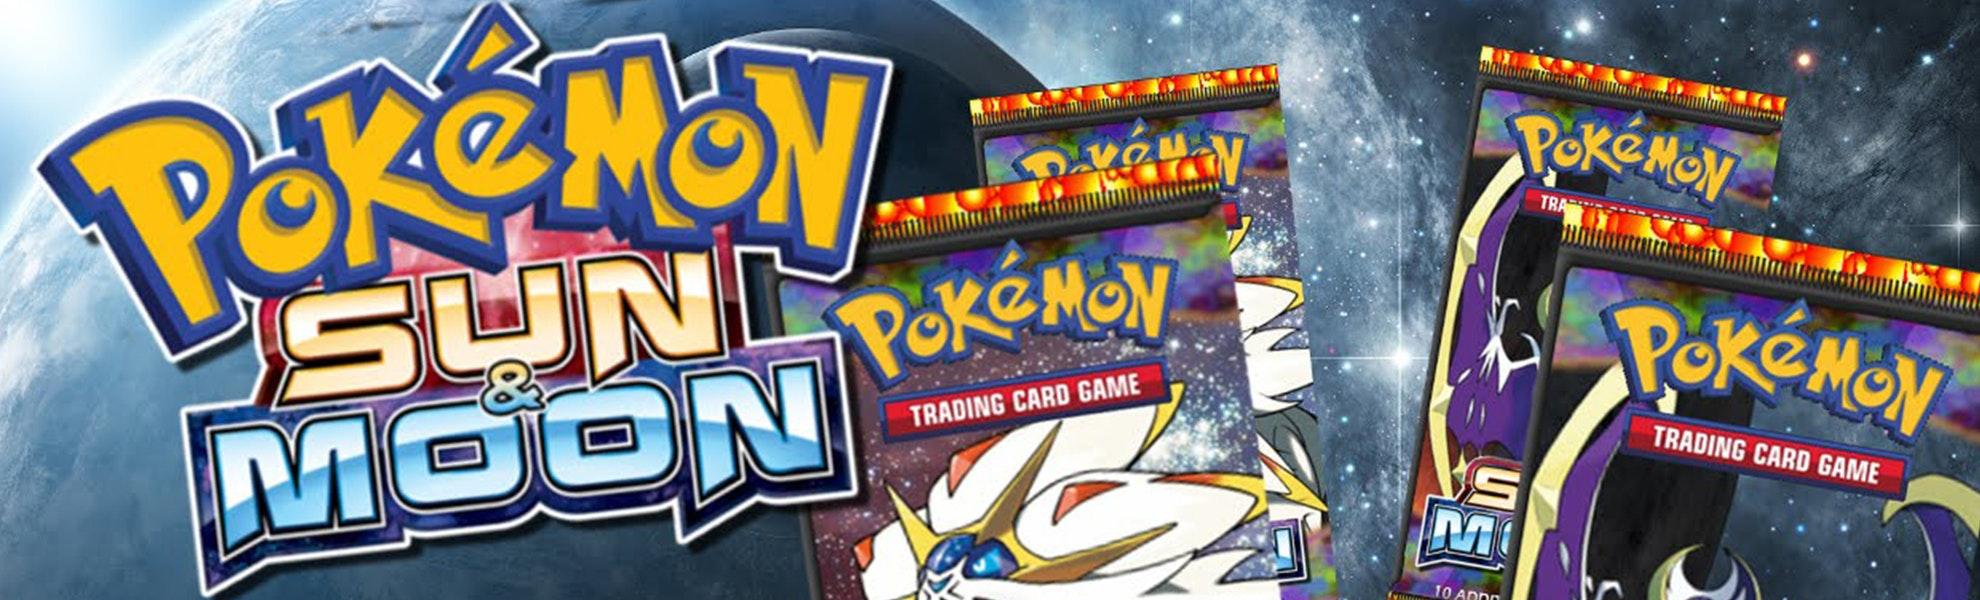 Pokémon Sun and Moon Booster Box